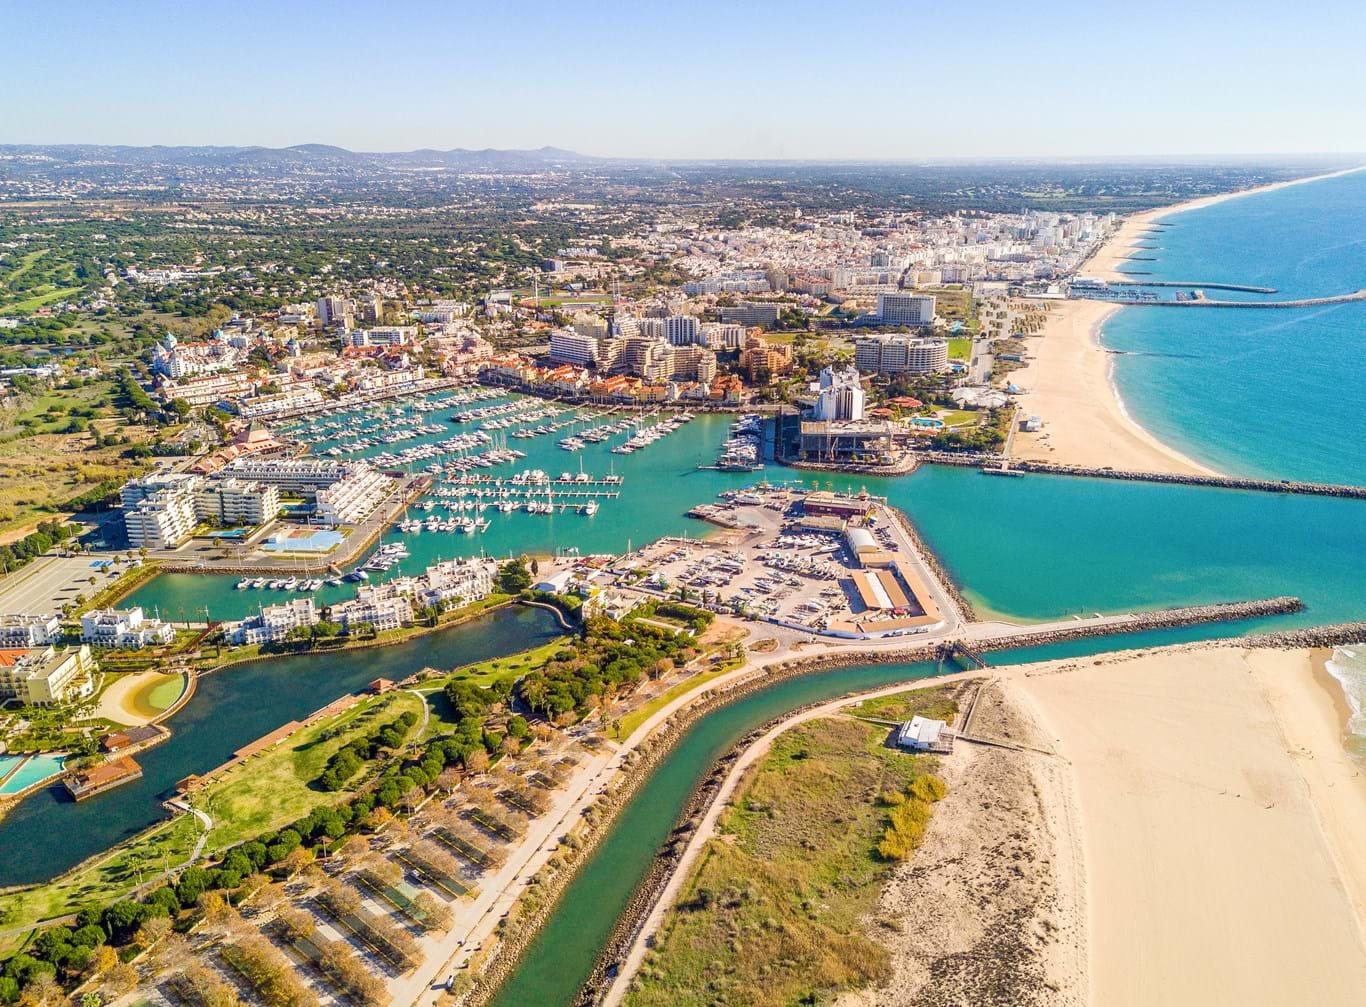 Vilamoura, the iconic Marina